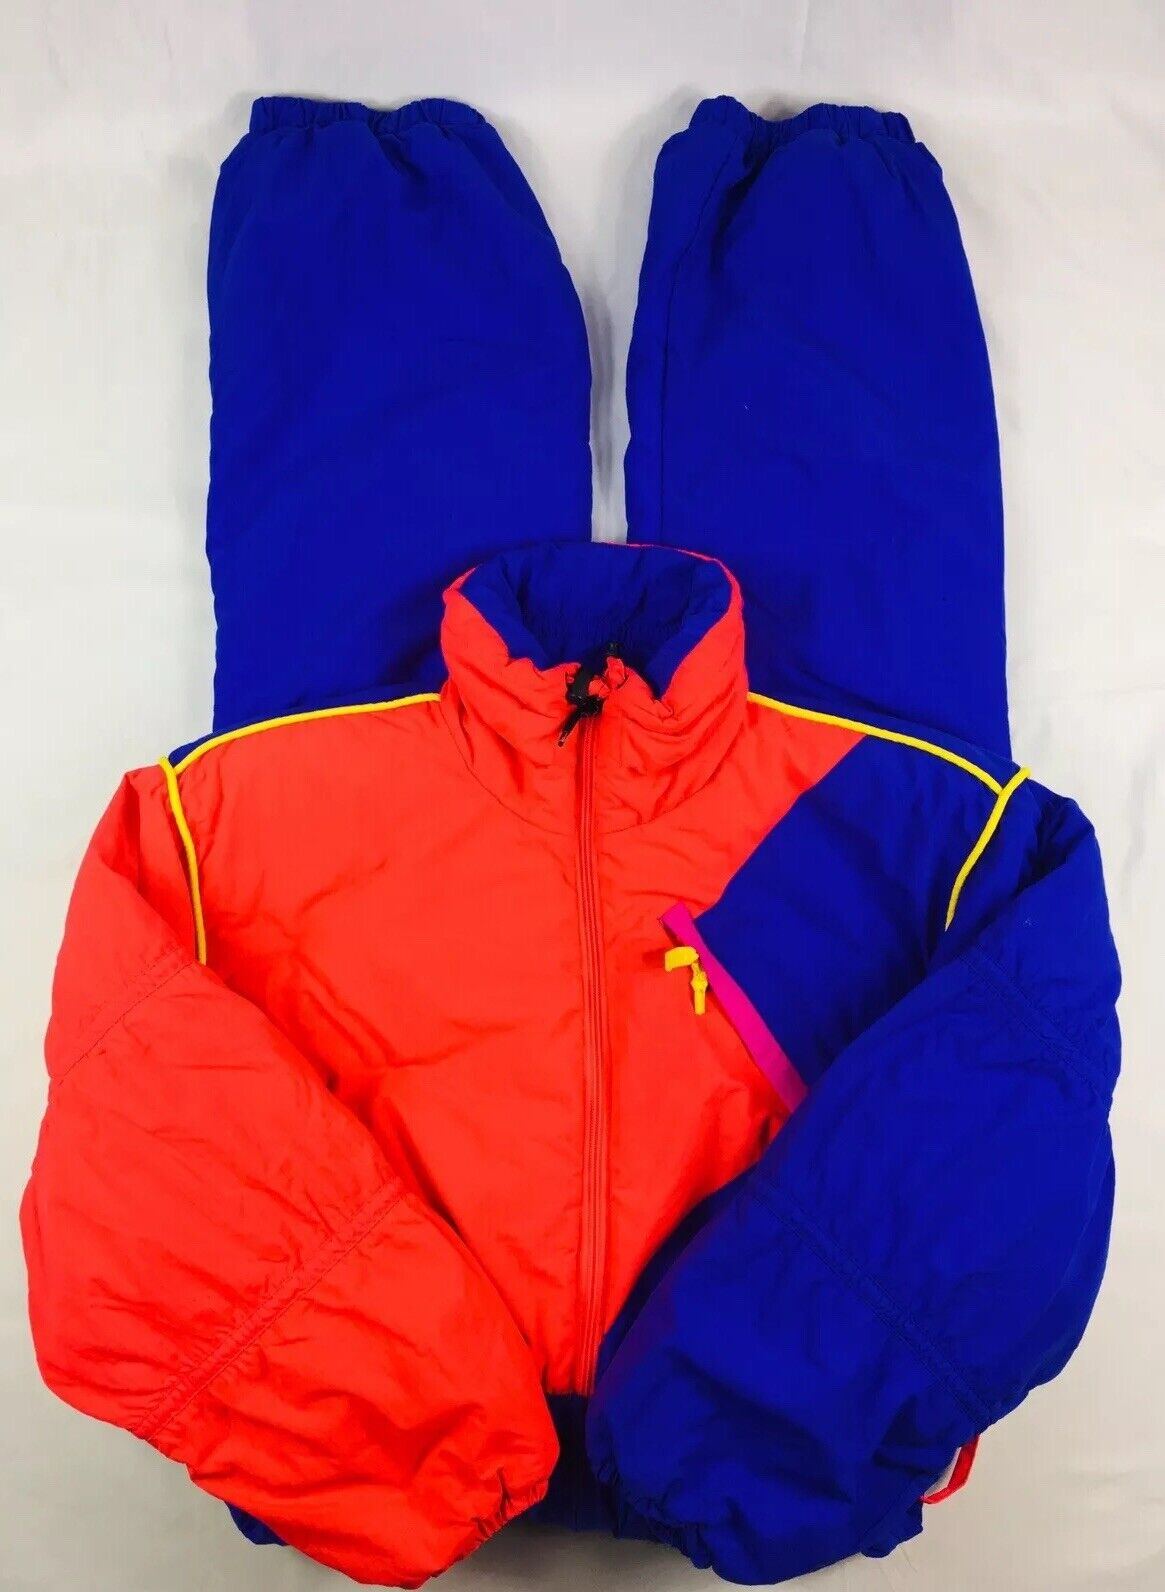 Obermeyer 1 Piece Snow Suit Vintage Retro colors Thinsulate Size Womens 14